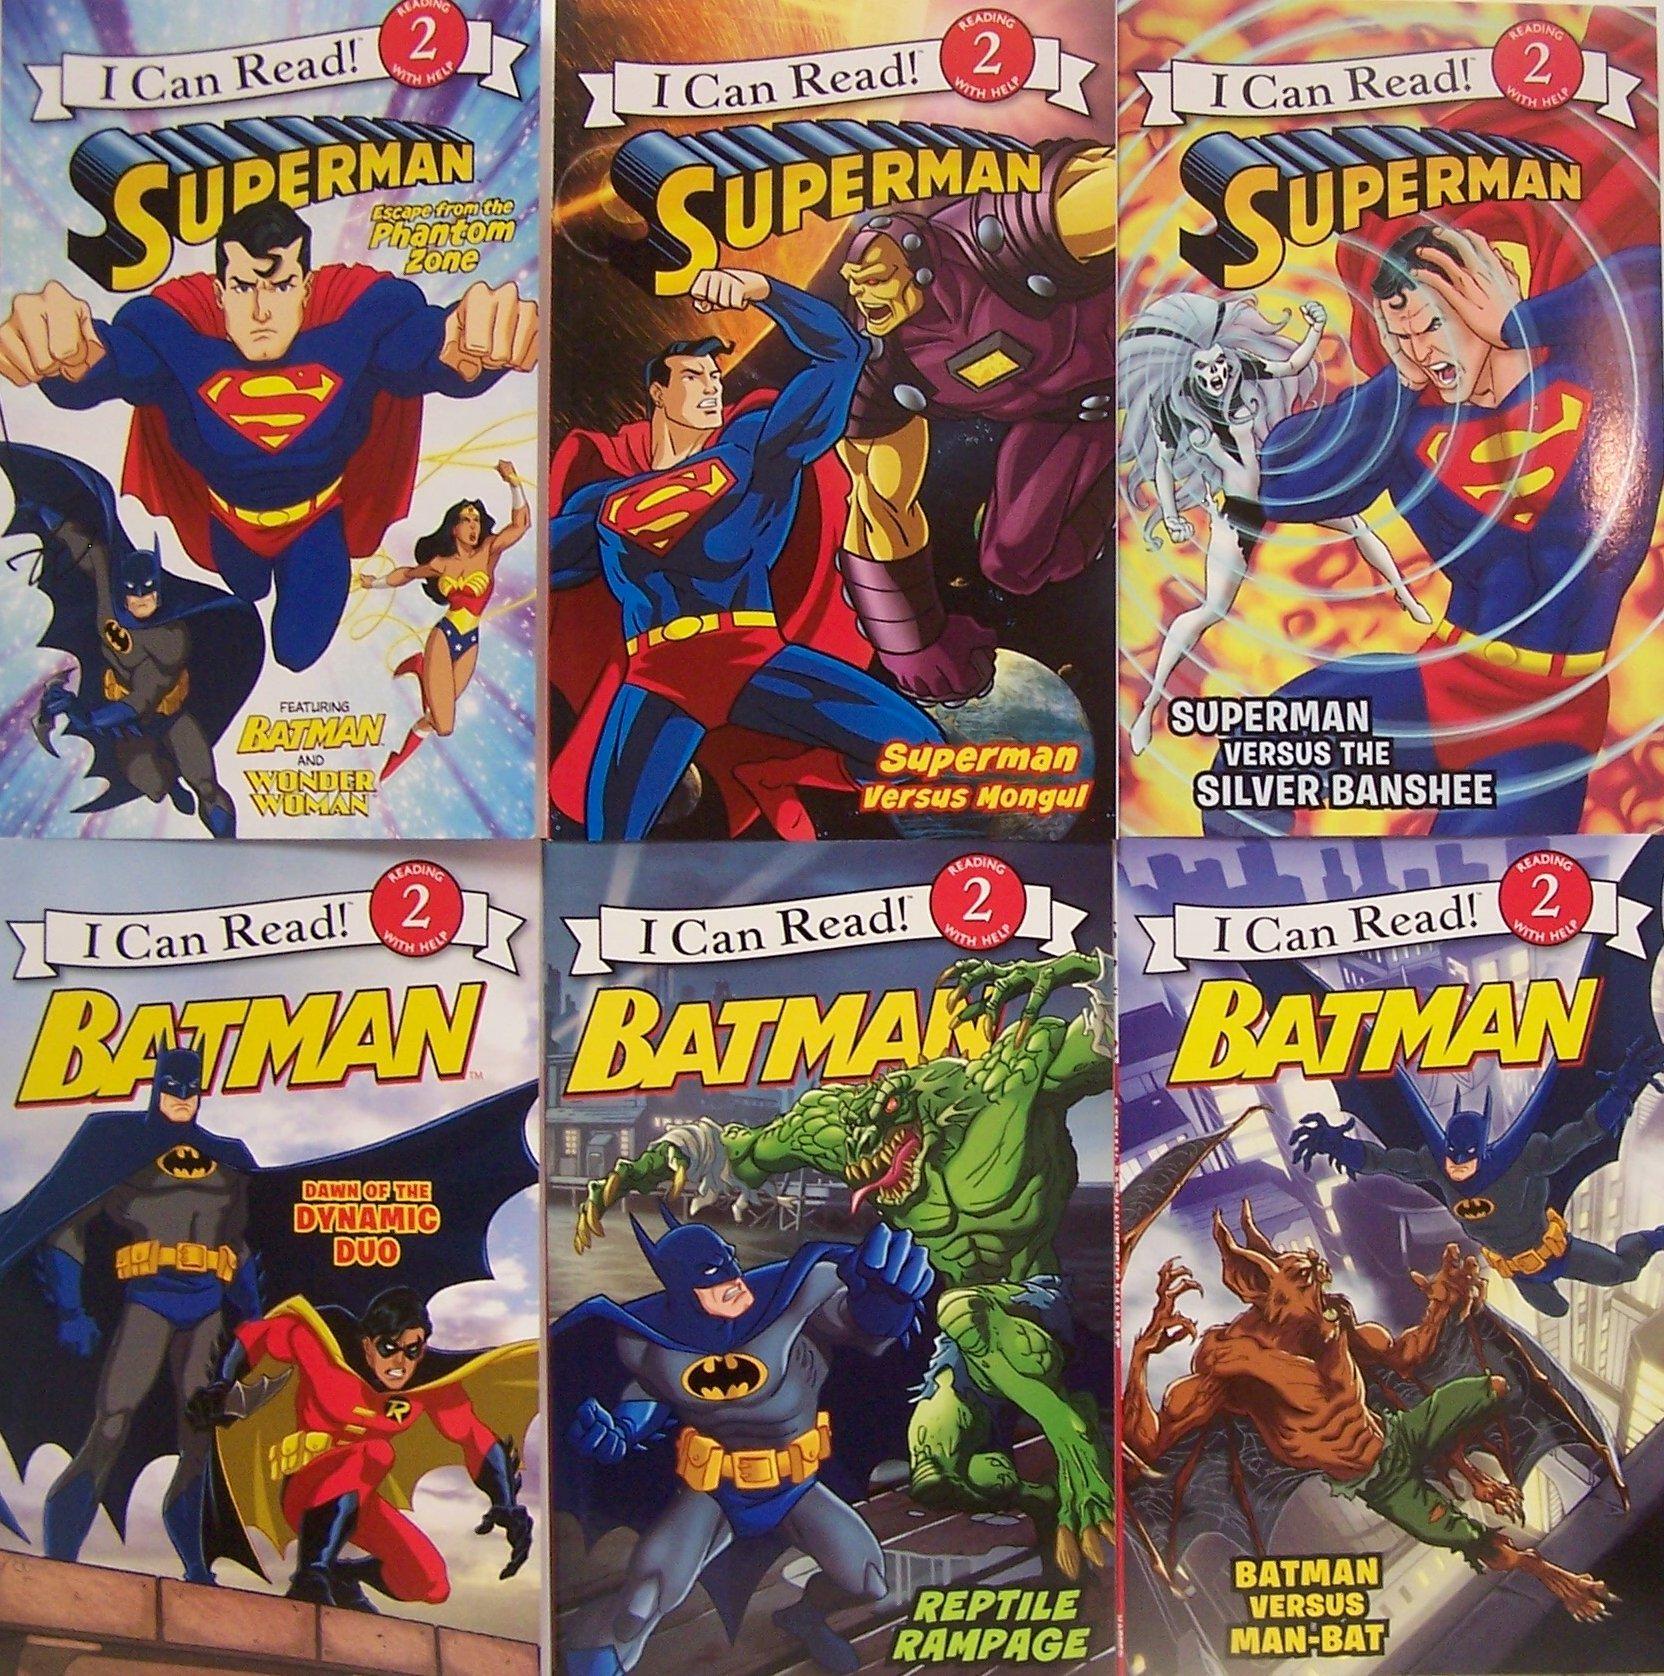 Read Online I Can Read Superman and Batman, Level 2 - 6 Book Set (Superman Escape from the Phantom Zone, Superman Versus Mongui, SupermanVersus the Silver Banshee, Batman Versus Man Bat, Batman Reptile Rampage, Batman Dawn of the Dyanmic Duo) ebook